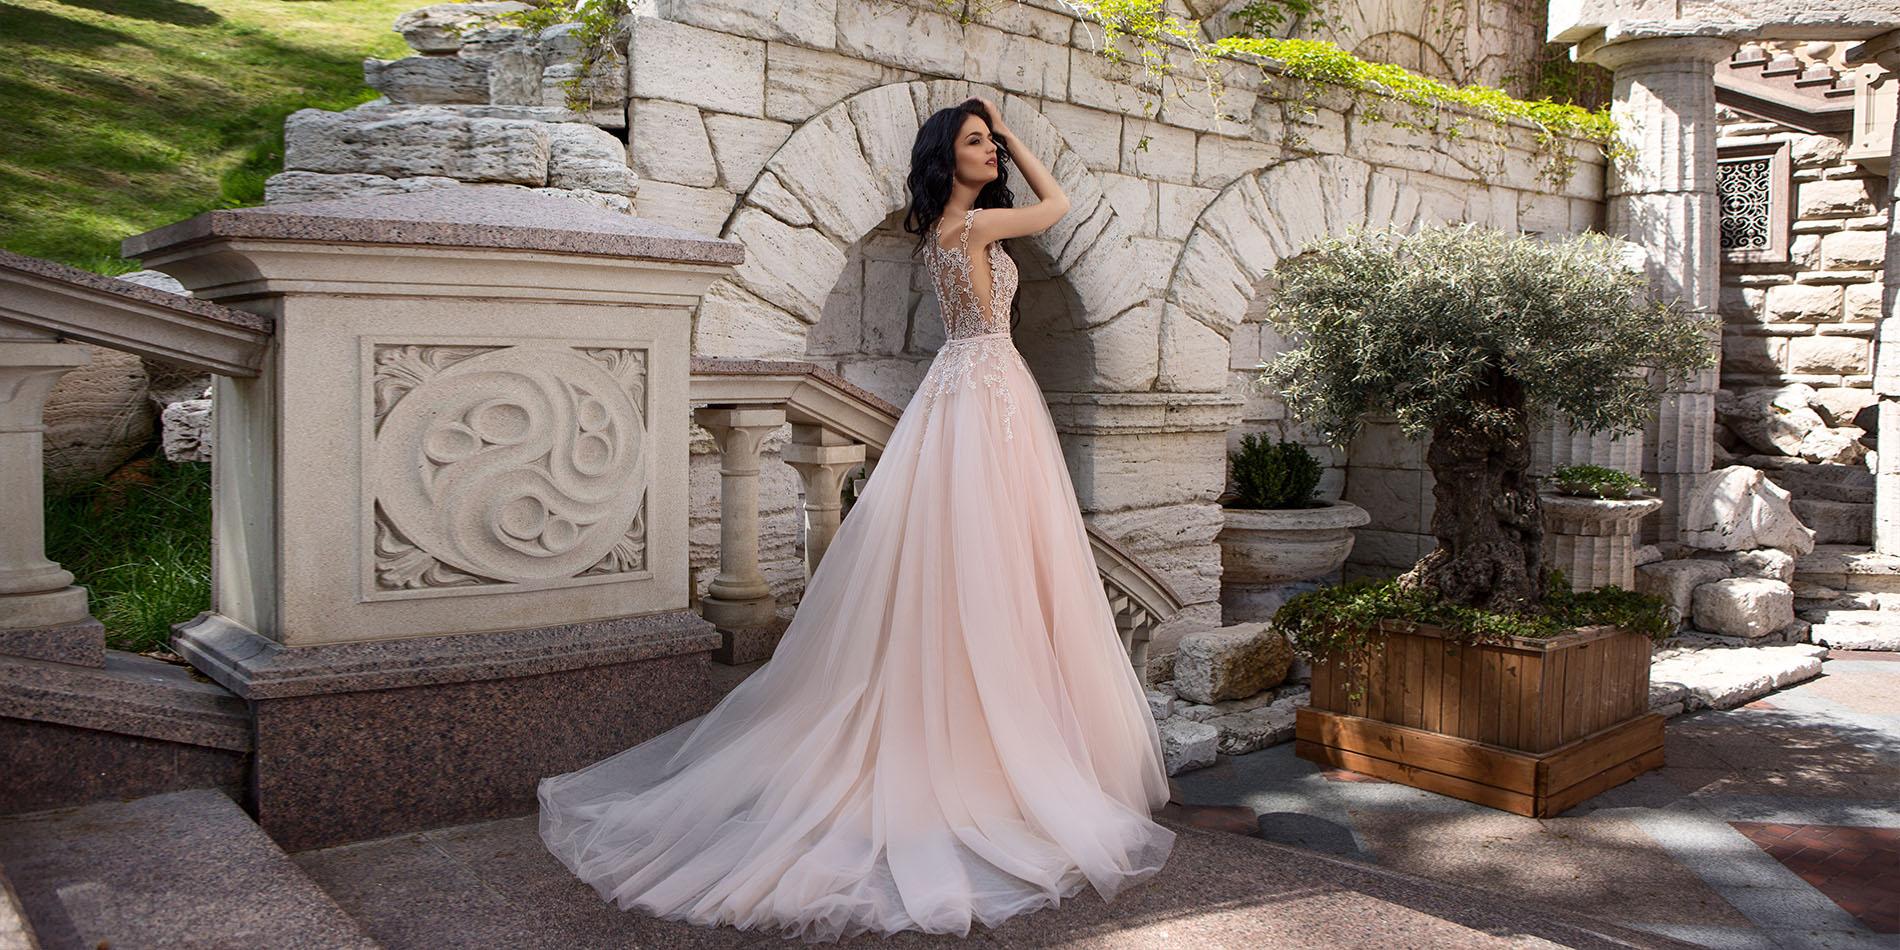 c54b060dfd suknia-23349008.jpg. źródło  madonna.pl